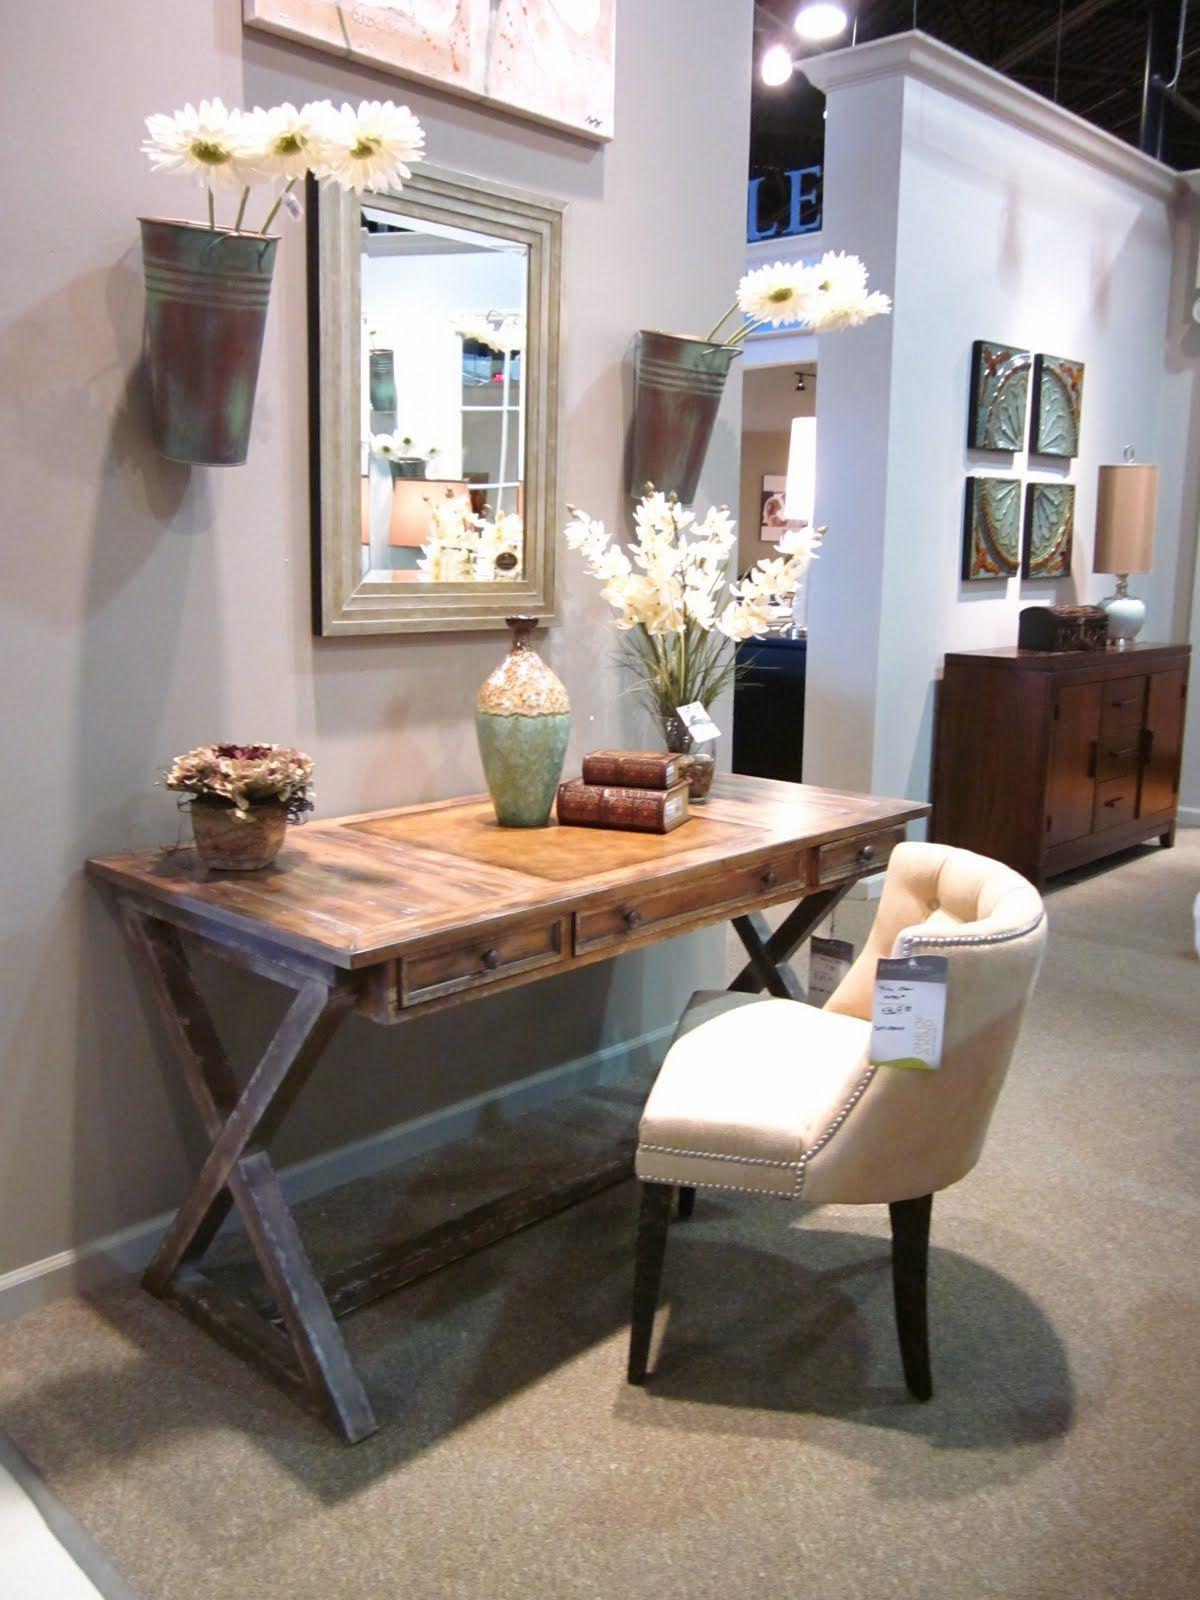 feminine desks marvellous design ideas   Savvy Spaces   Hallway office, Home office decor, Home ...